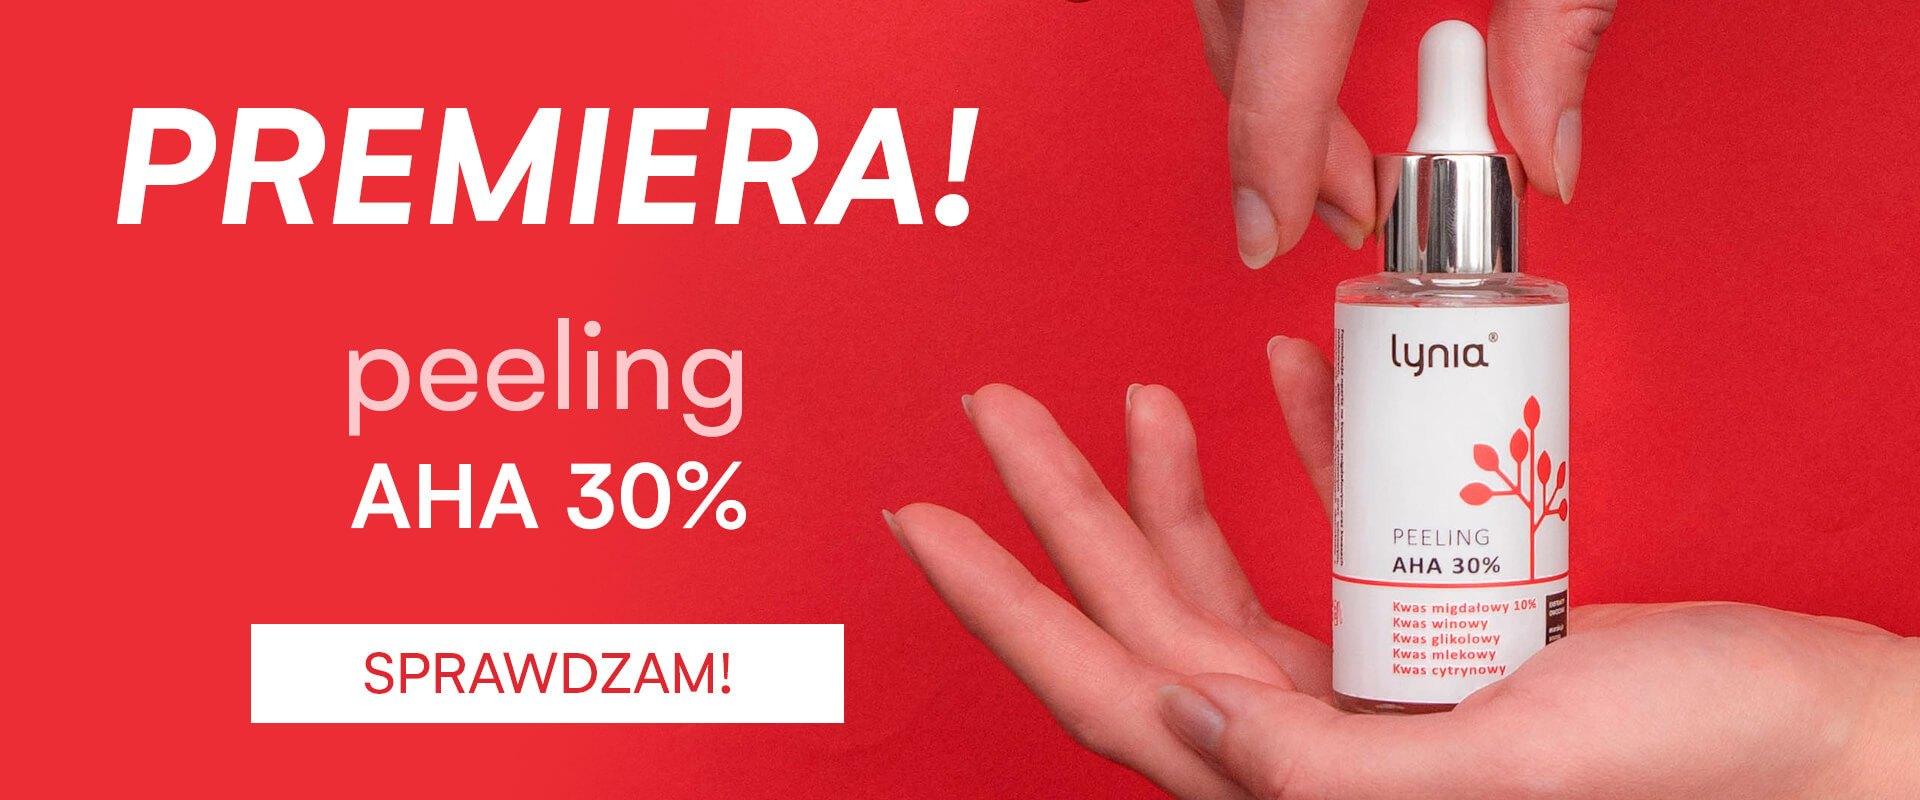 Peeling AHA 30% Lynia - premiera